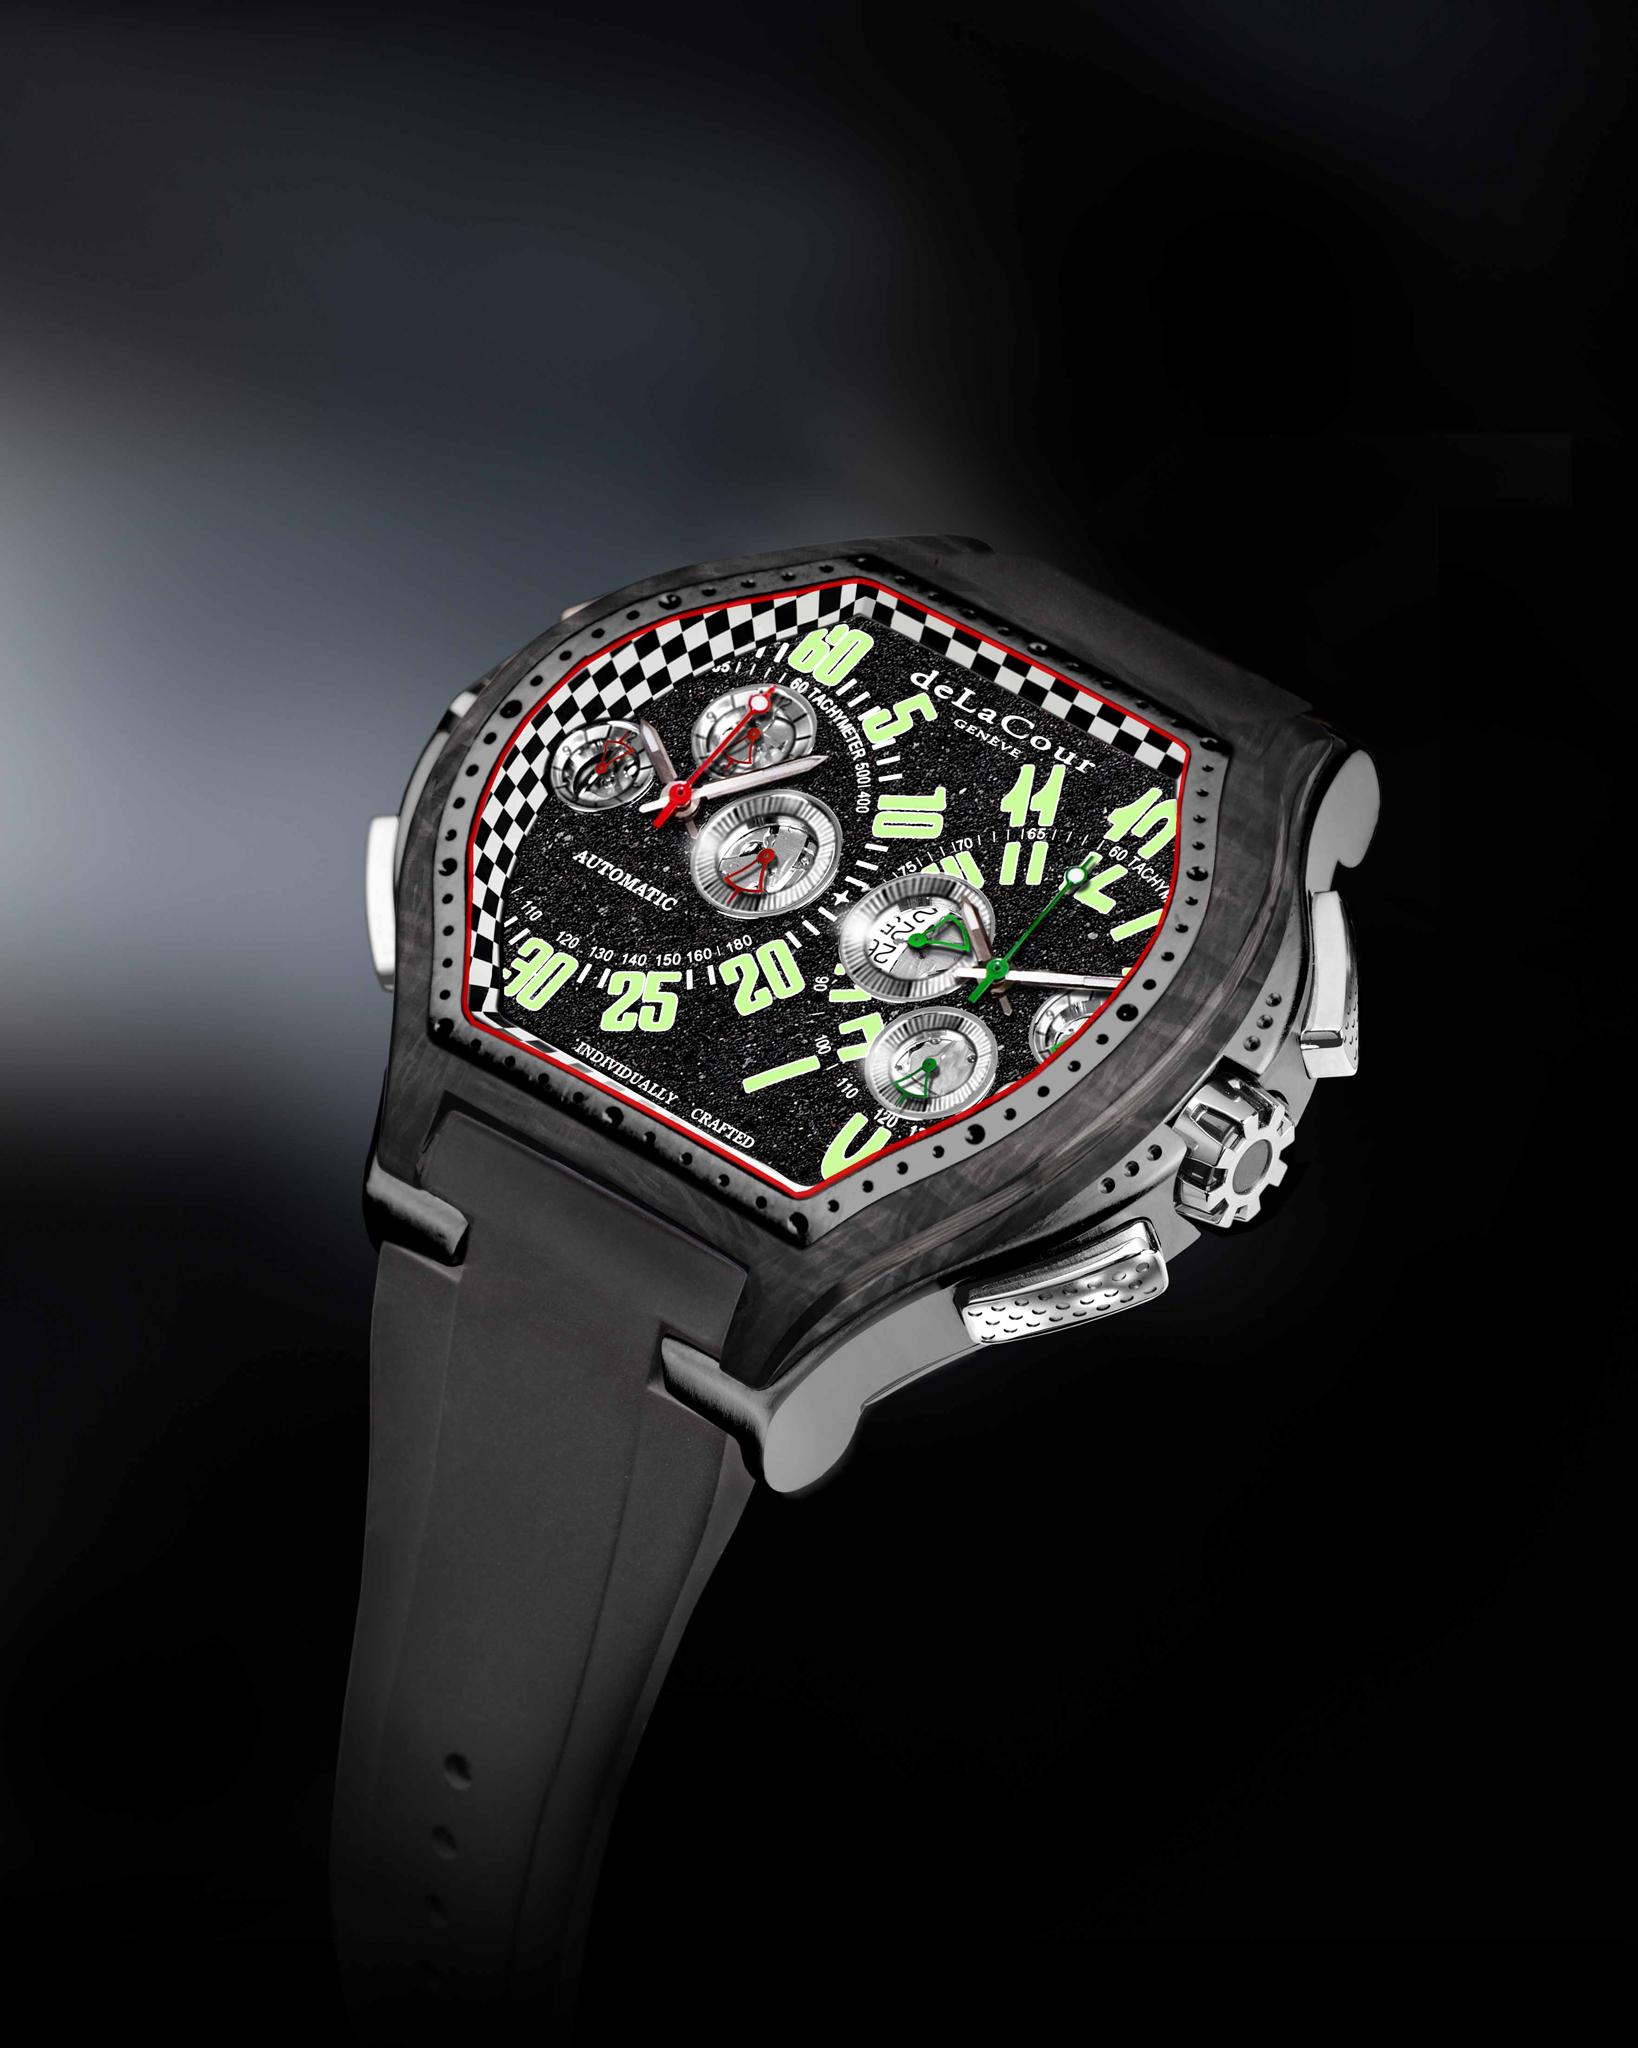 Характеристики часов delacour christophe claret bitourbillon: механизм dc на 78 камнях.